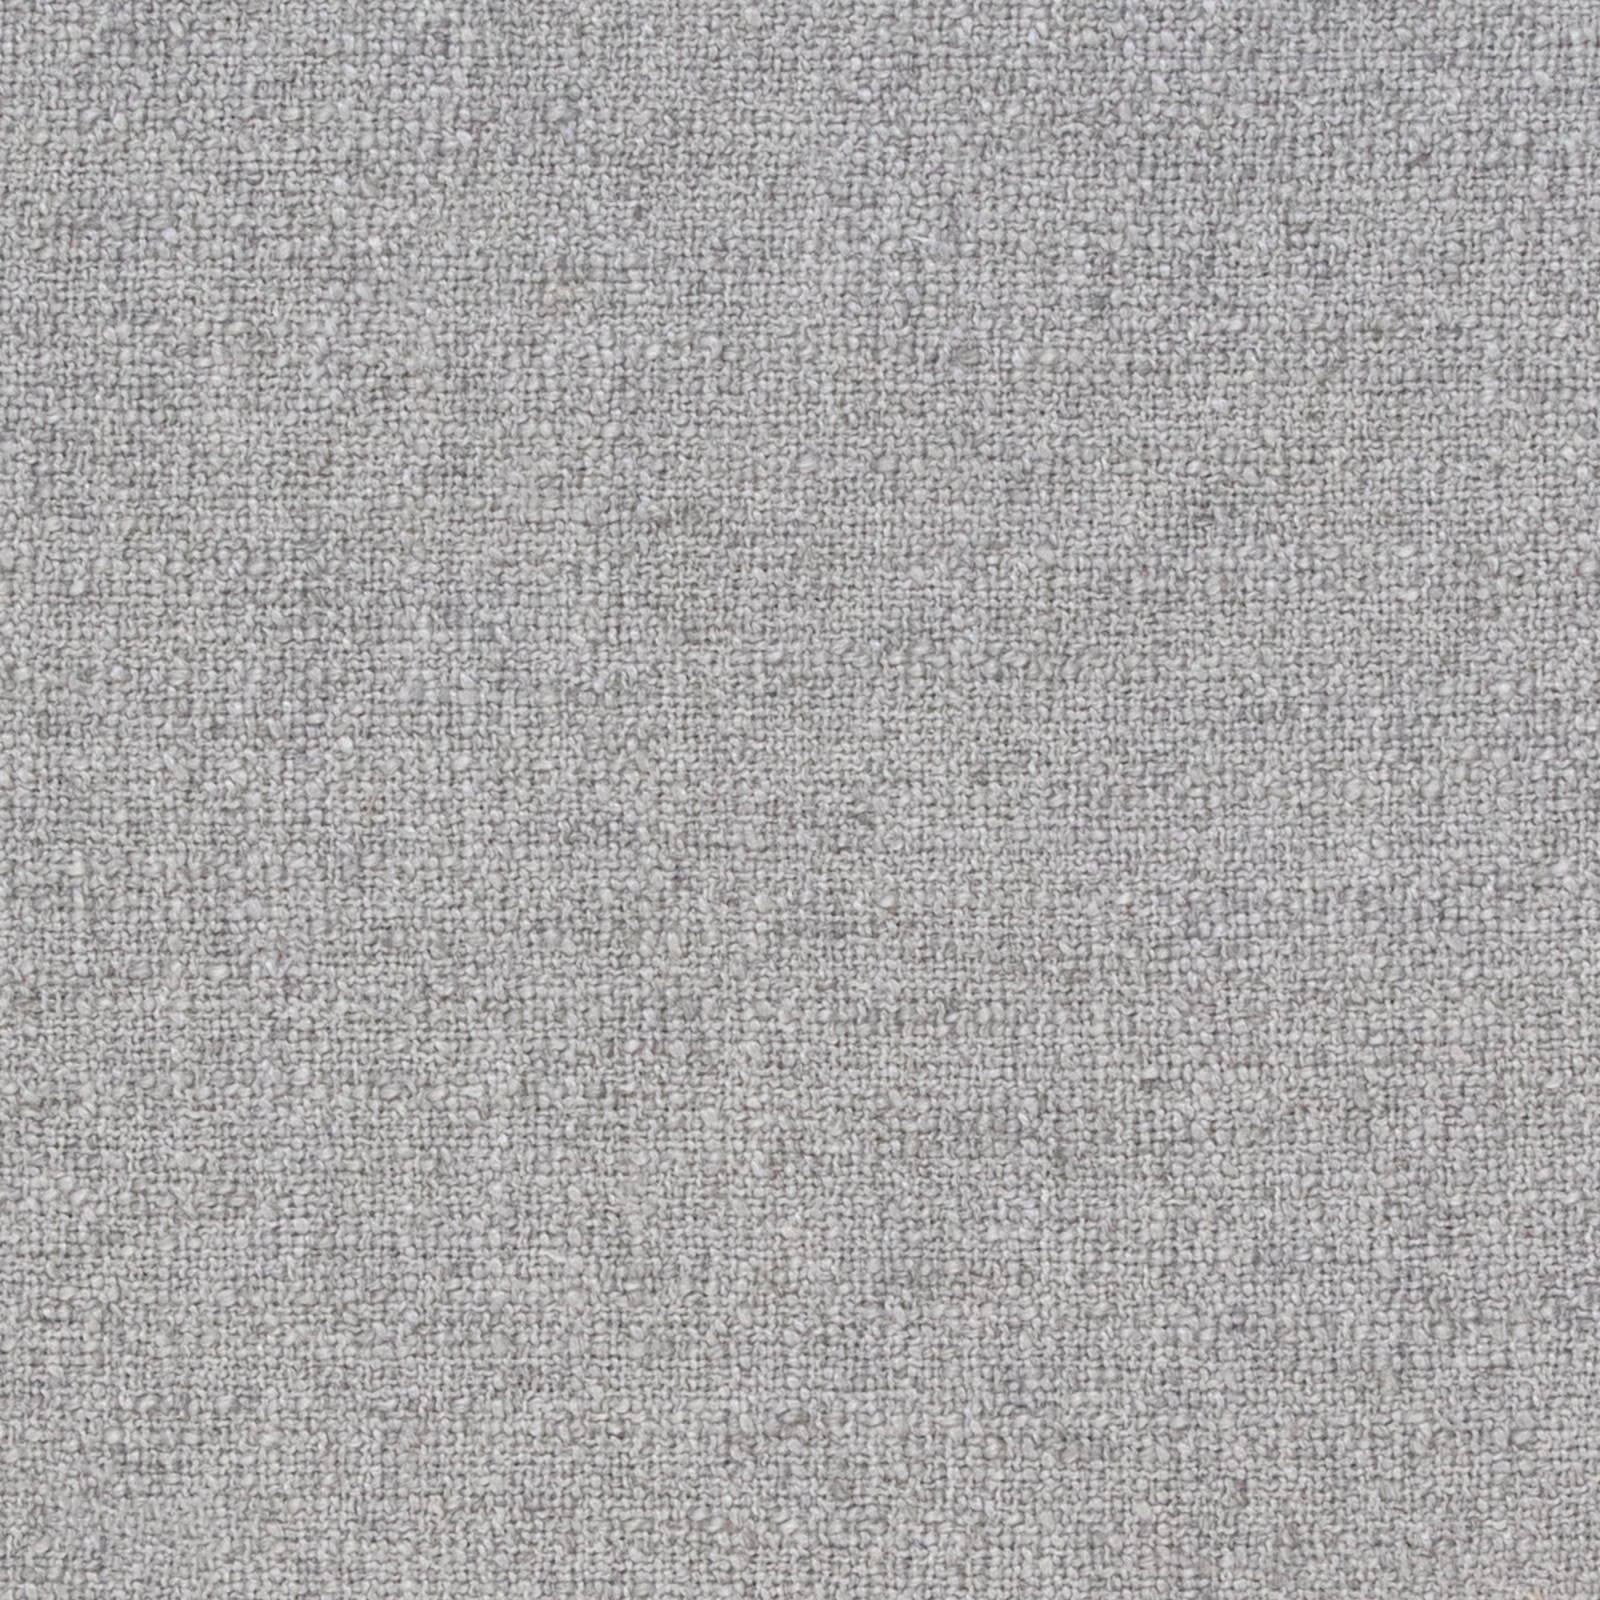 grey sofa fabric texture latest designs b9187 light greenhouse fabrics